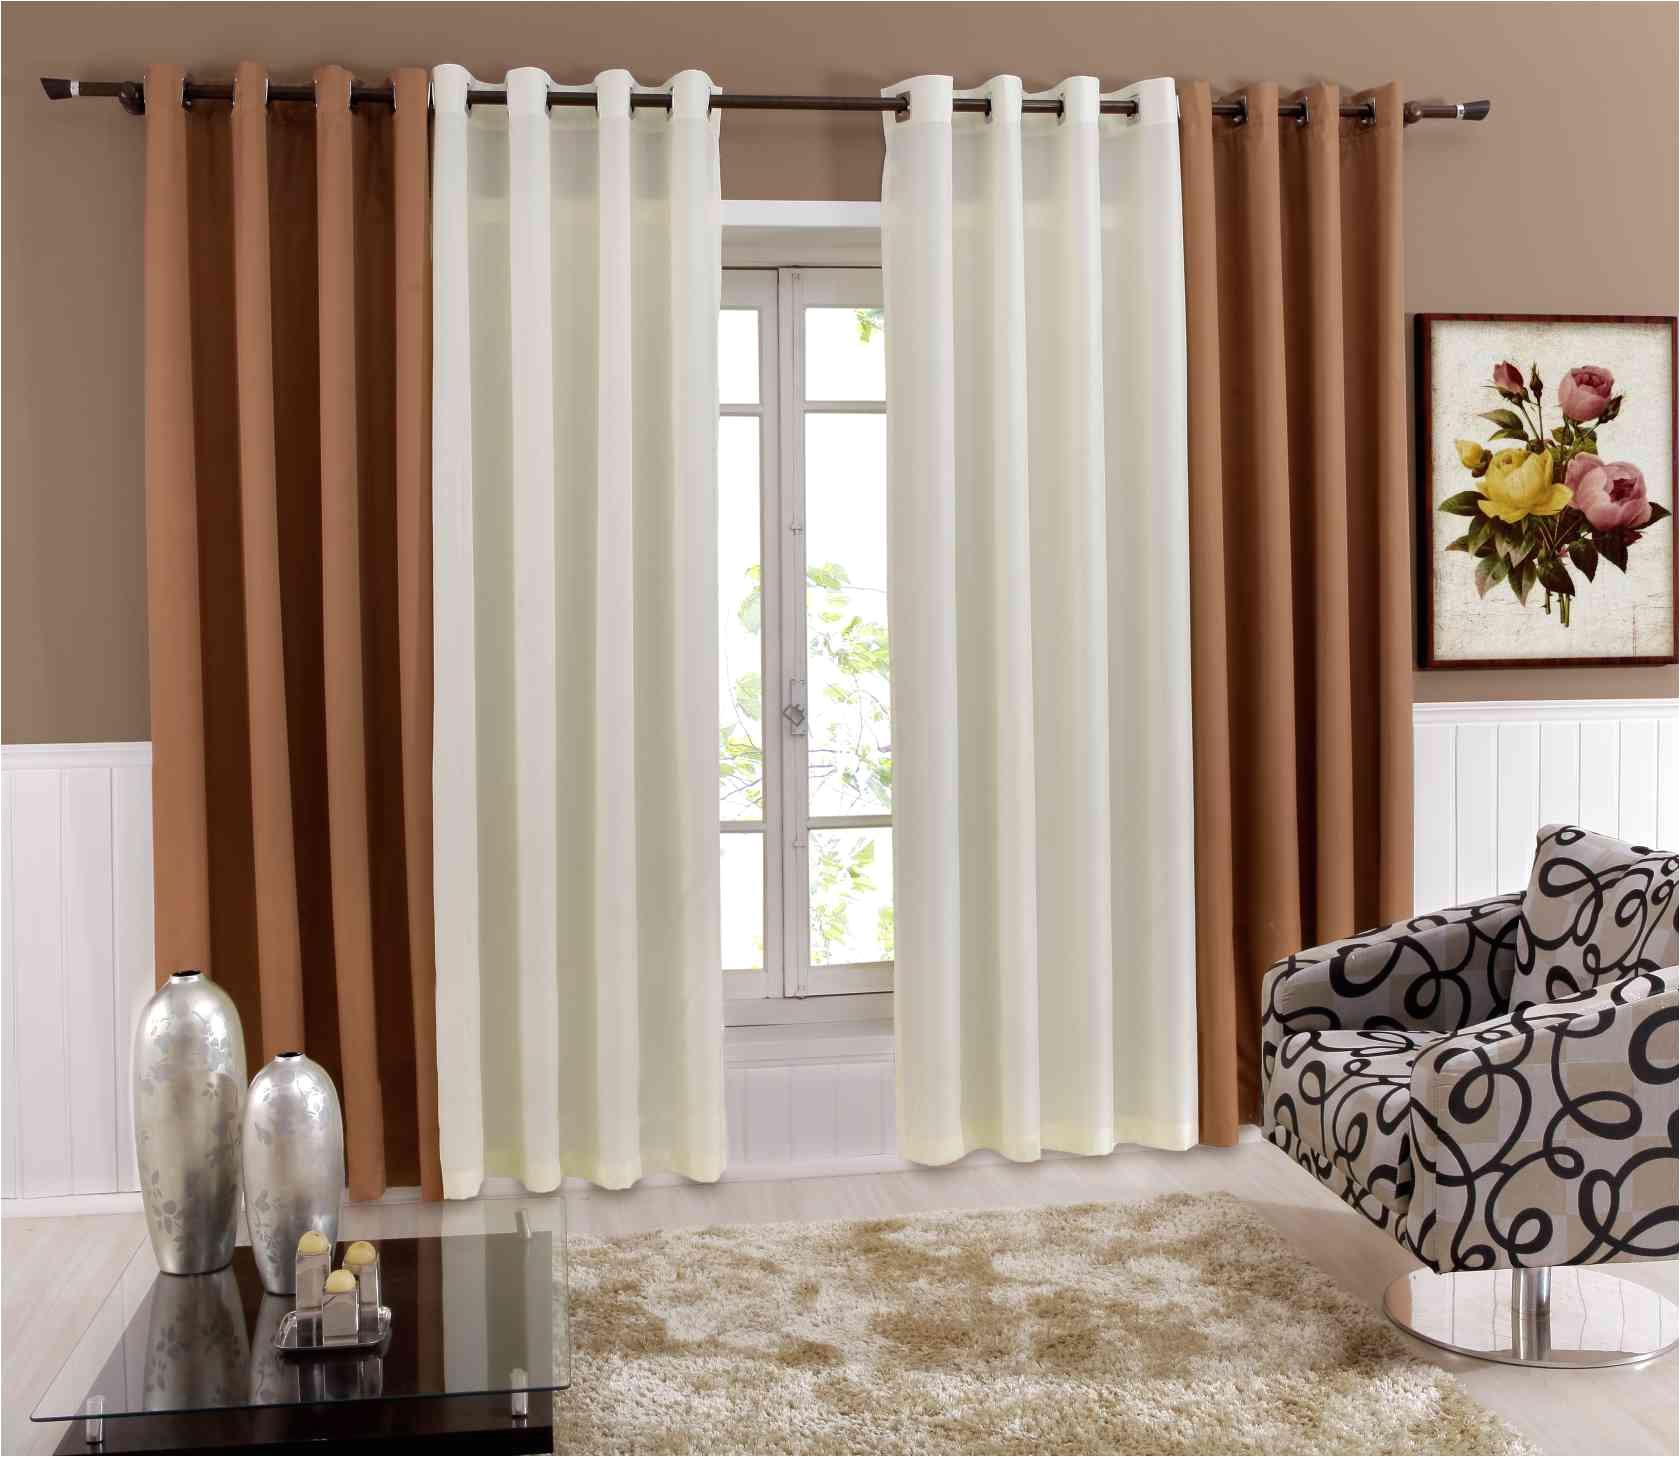 cortinas salon modernas lujo bonito modelos de cortinas para salas modernas regalo ideas de of cortinas